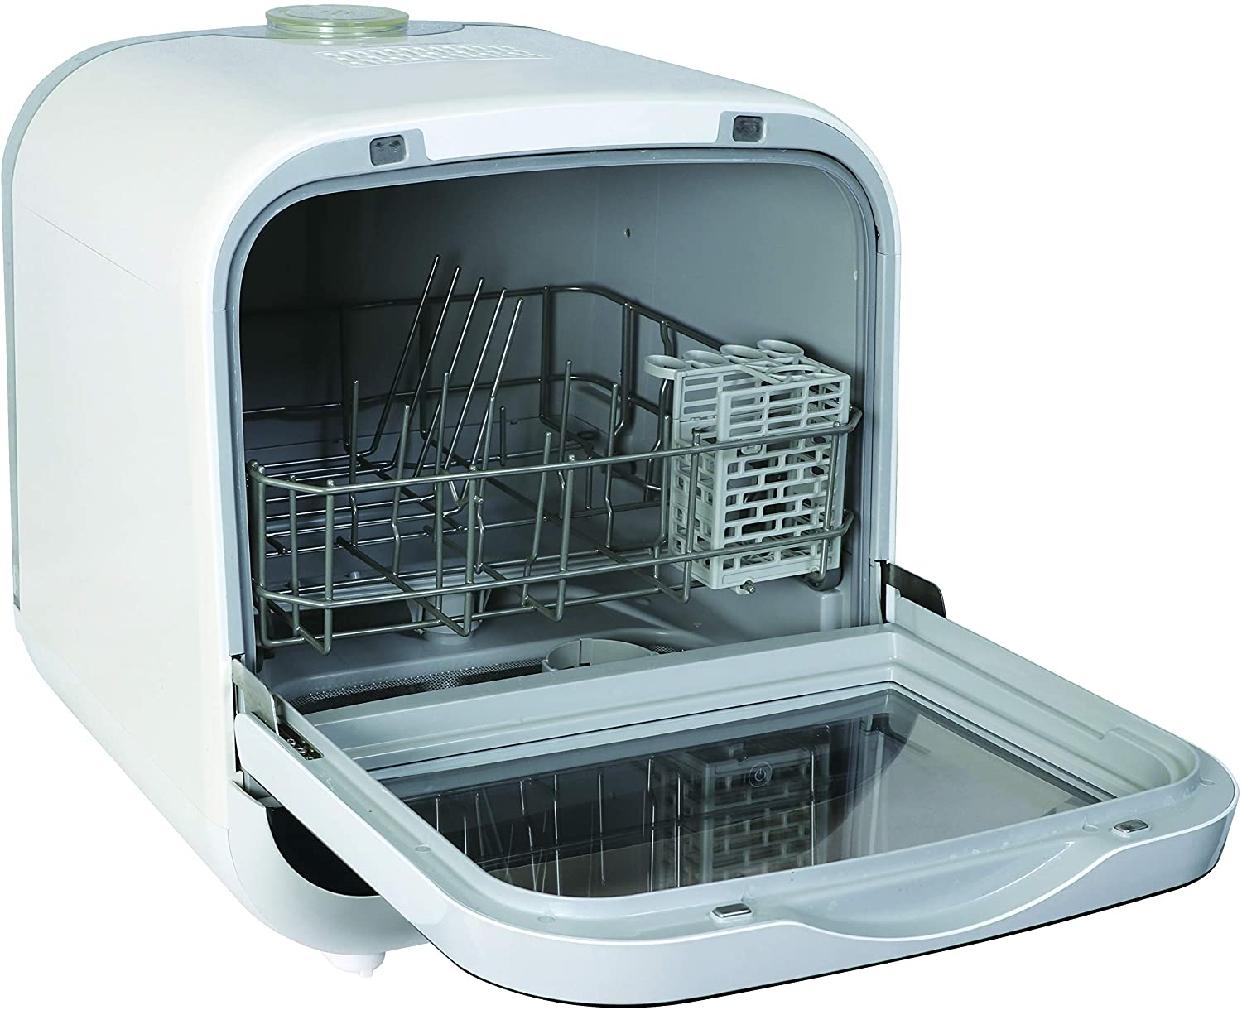 SK Japan(エスケイジャパン) 食器洗い乾燥機 Jaime SDW-J5Lの商品画像2